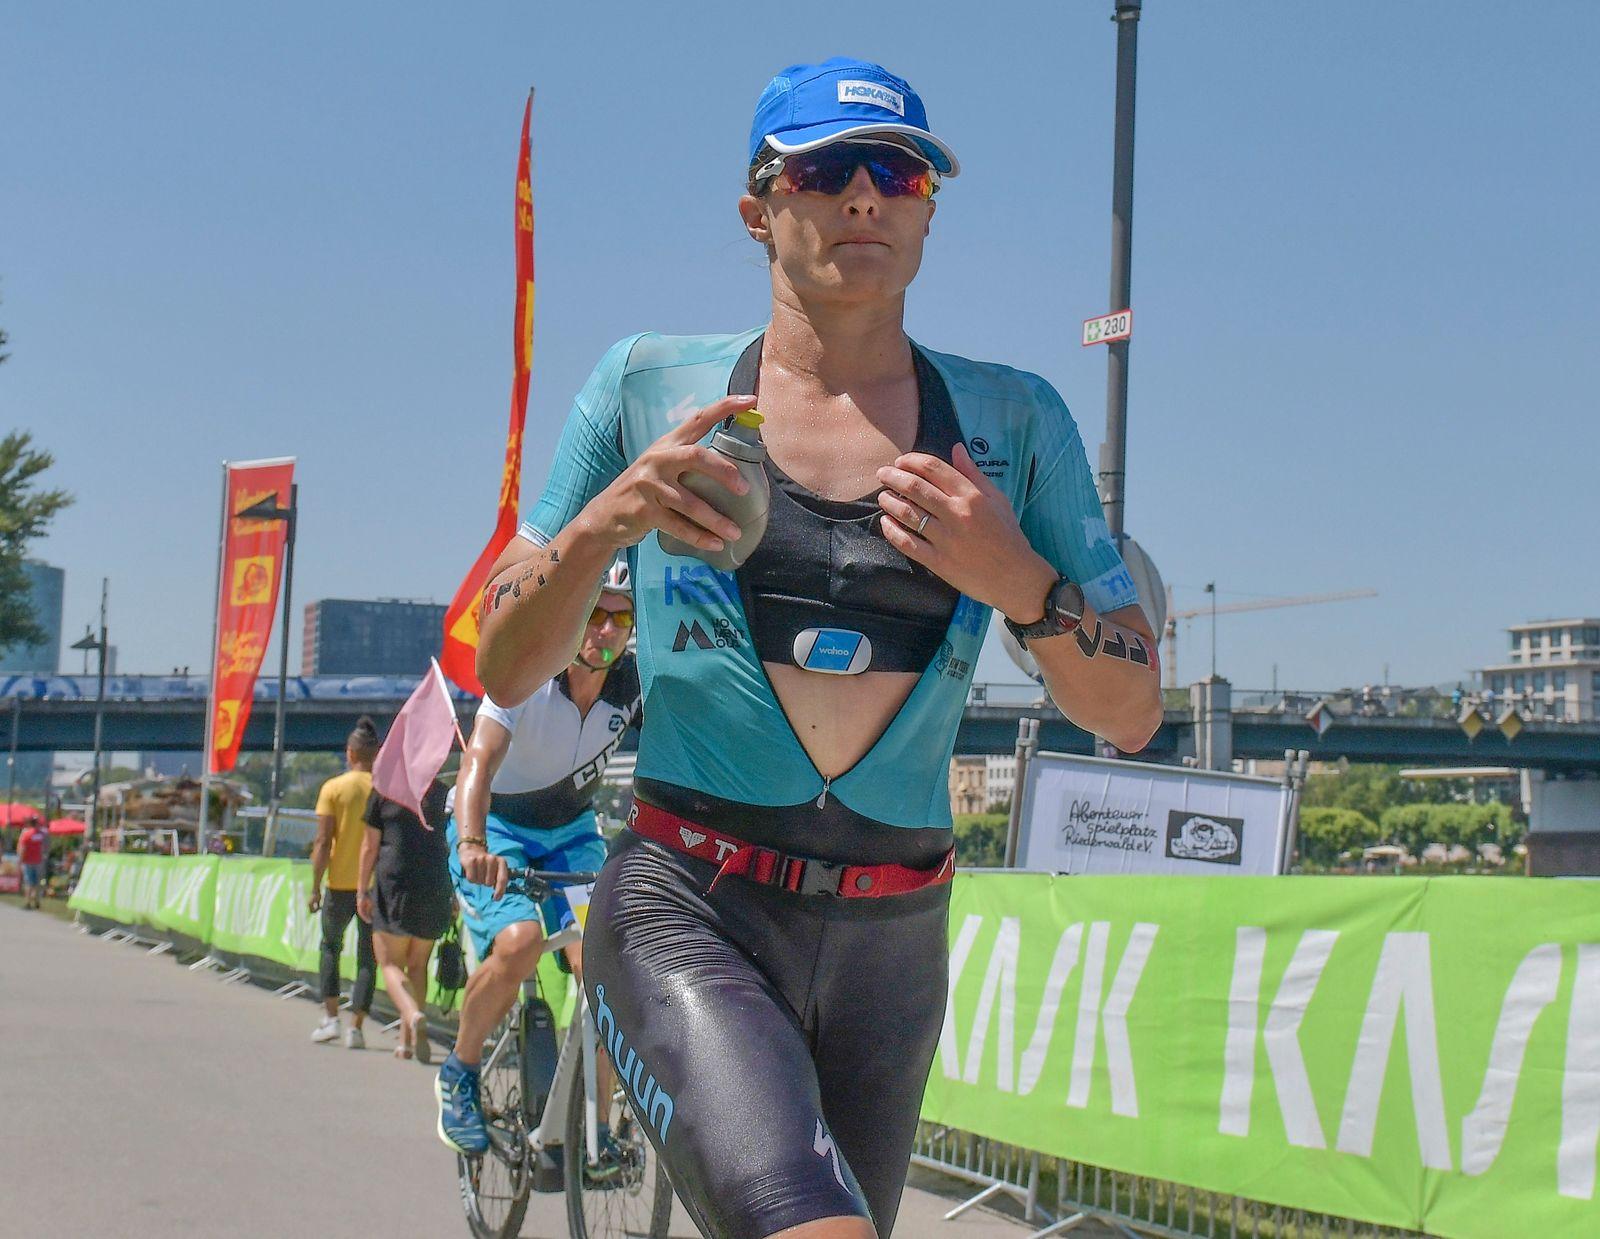 Triathlon Ironman, Mainova European Championship - Frankfurt 2019